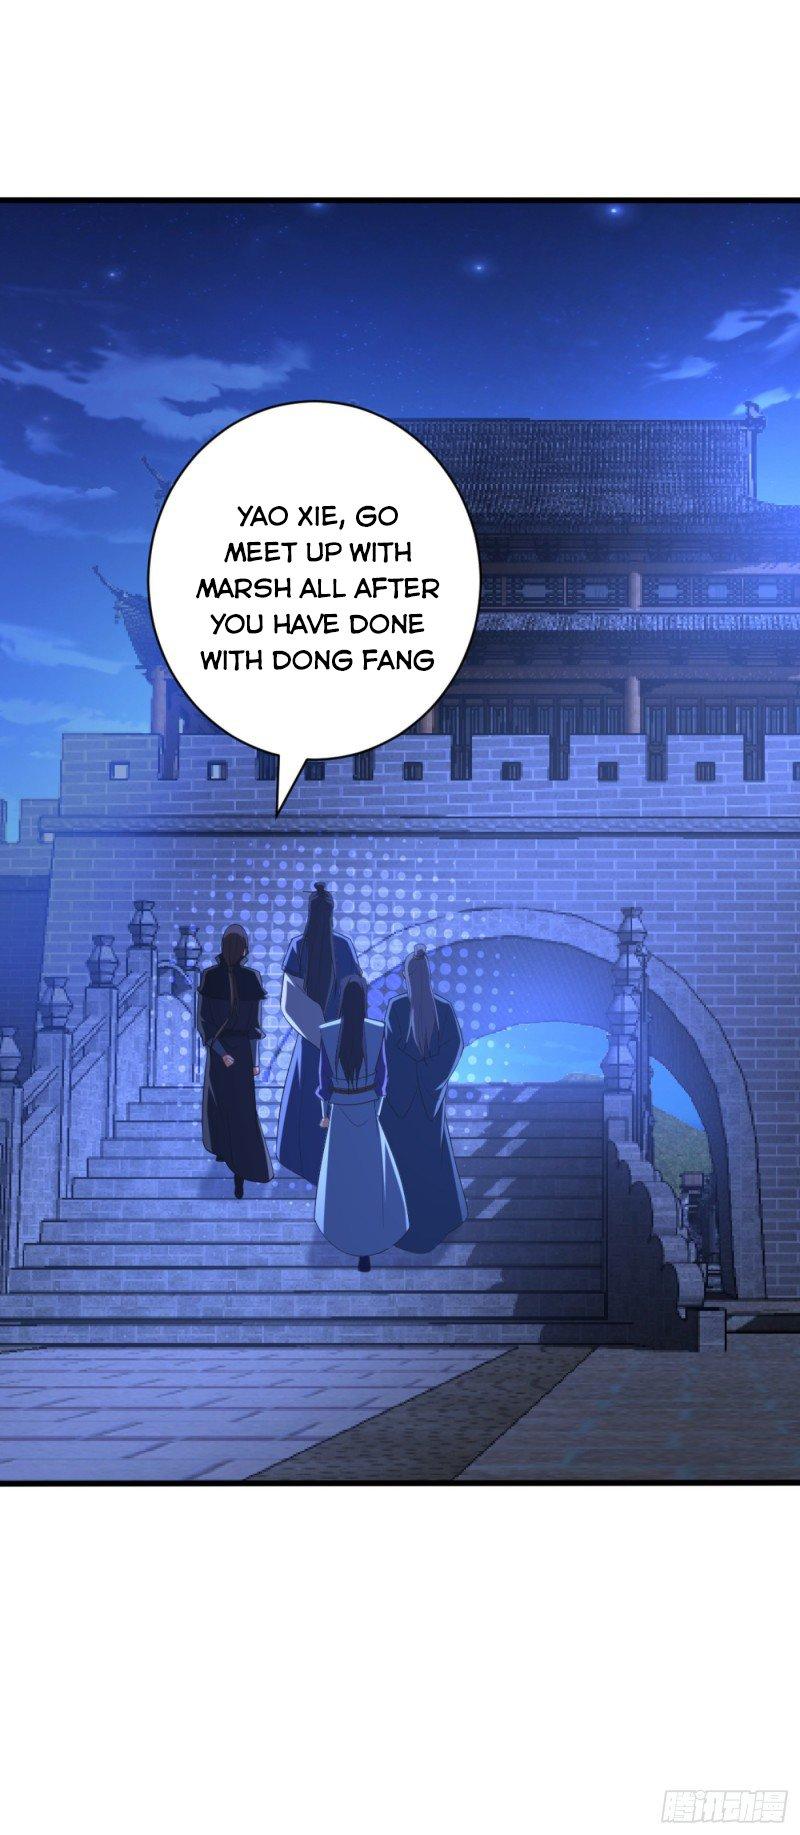 https://img3.nineanime.com/comics/pic4/41/24169/2738270/892affbf0ca609fa5973b694e30a5791.jpg Page 1